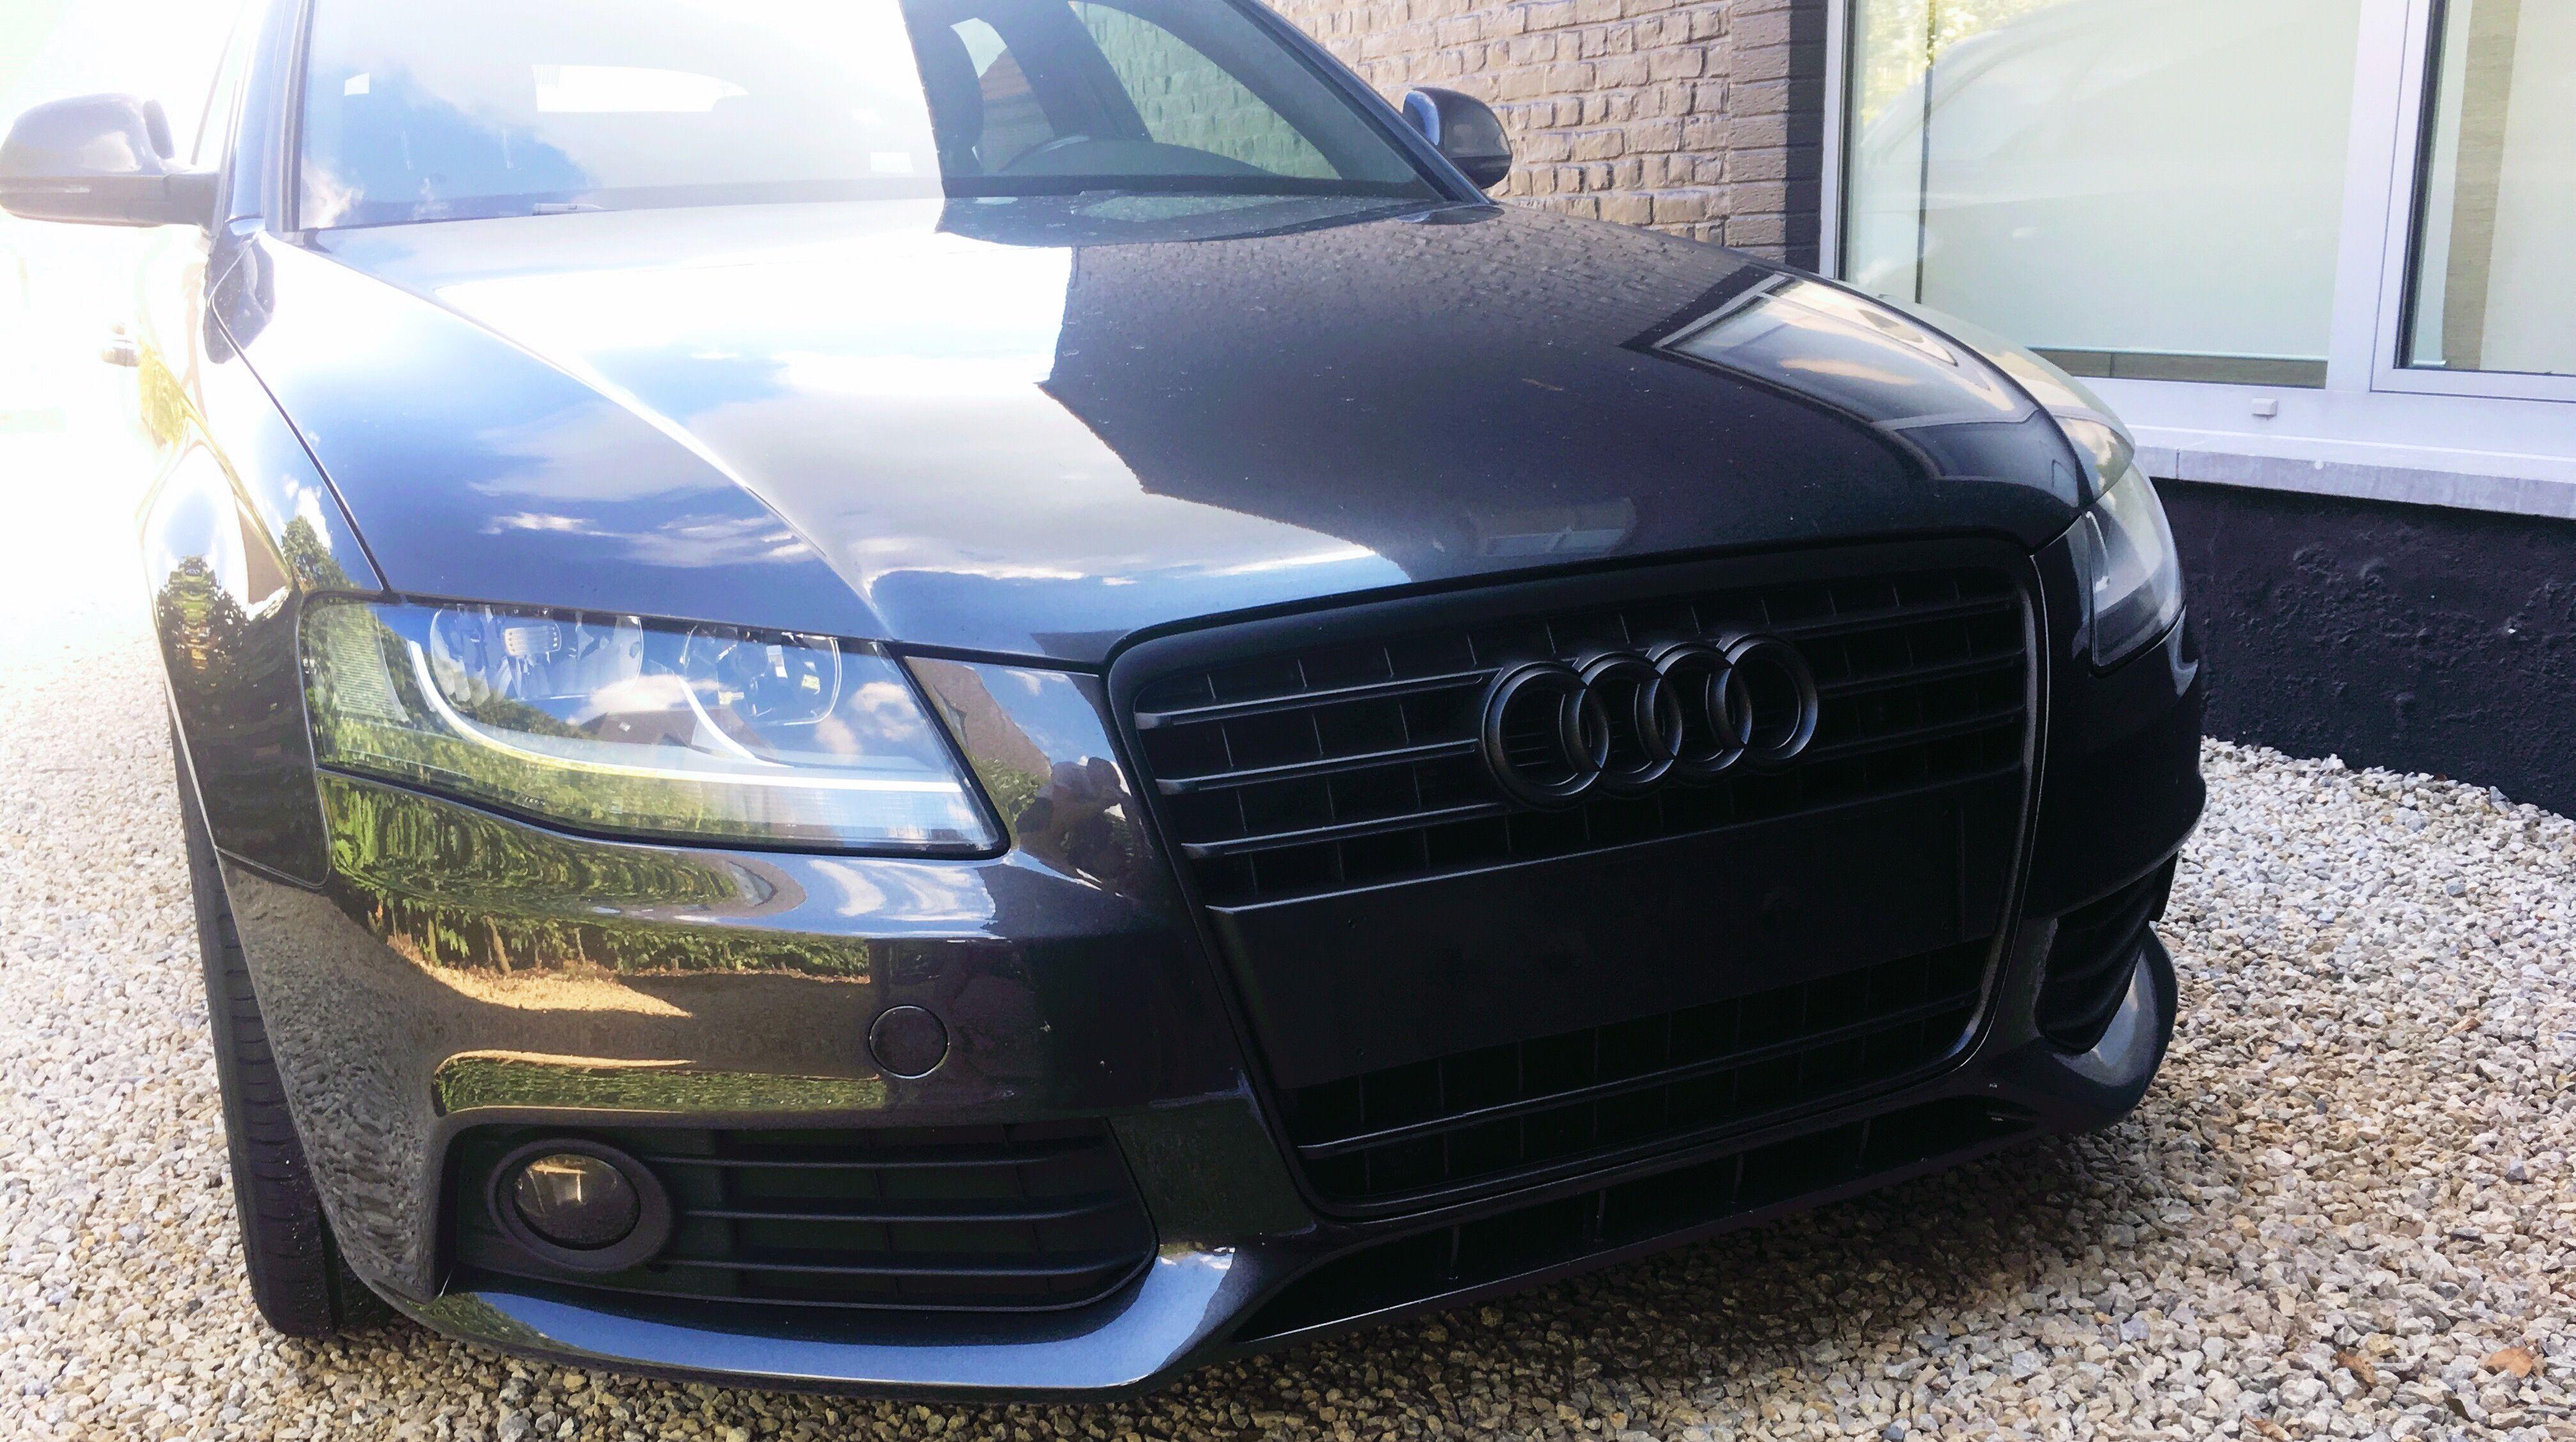 Audi Plasti Dip Grille - Year of Clean Water